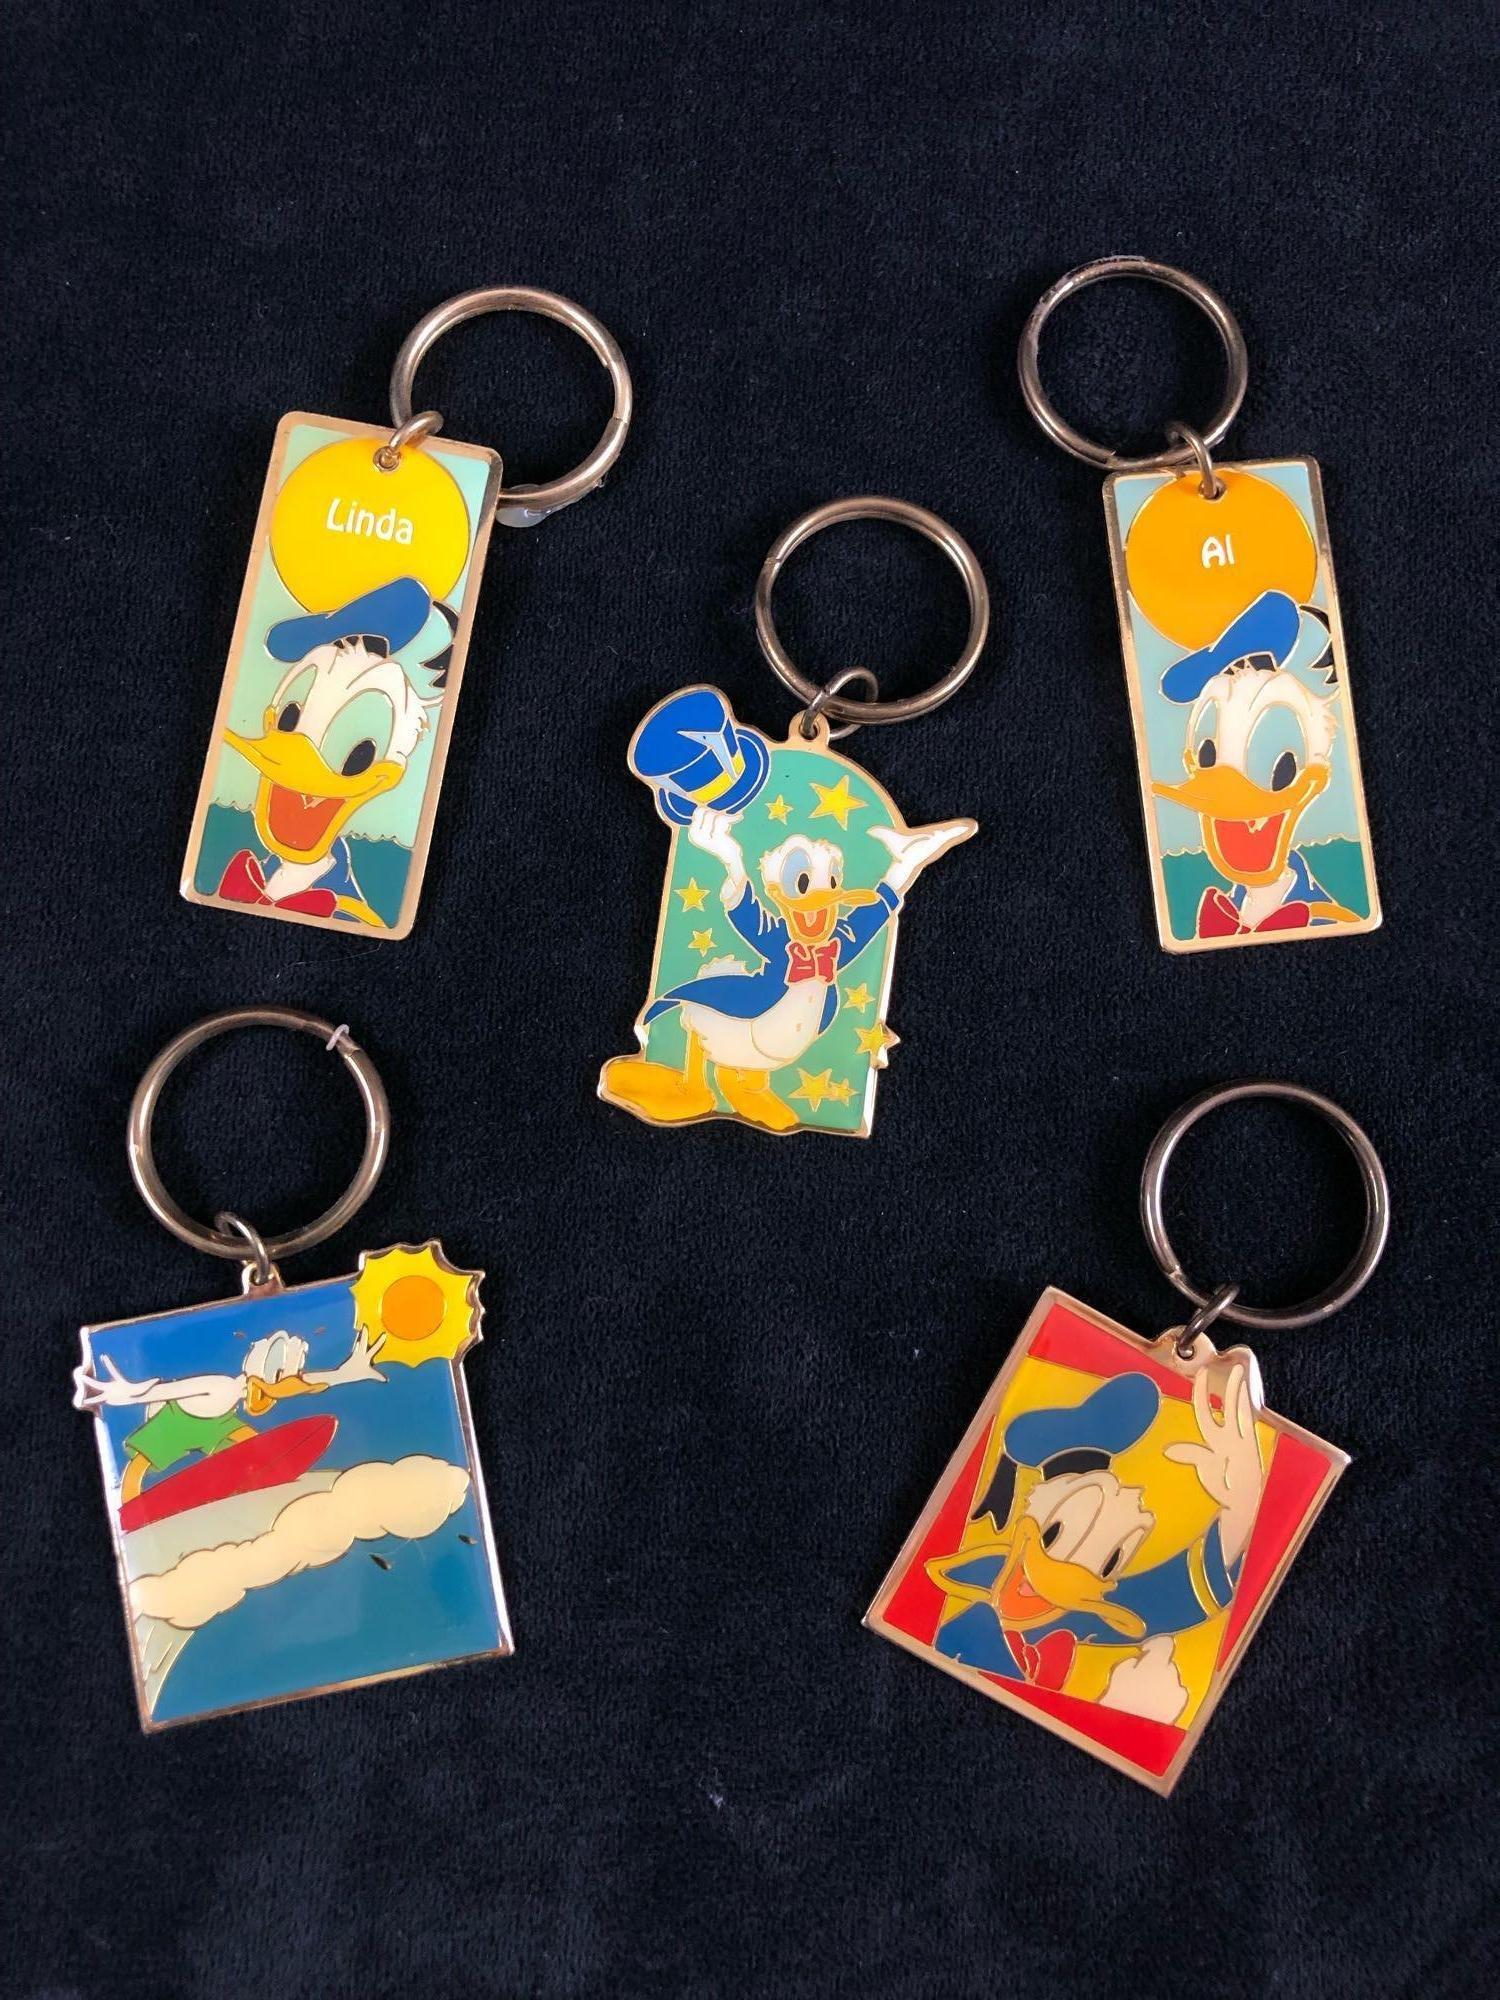 Lot of 5 Rare Vintage Donald Duck Disney Keychain Gold